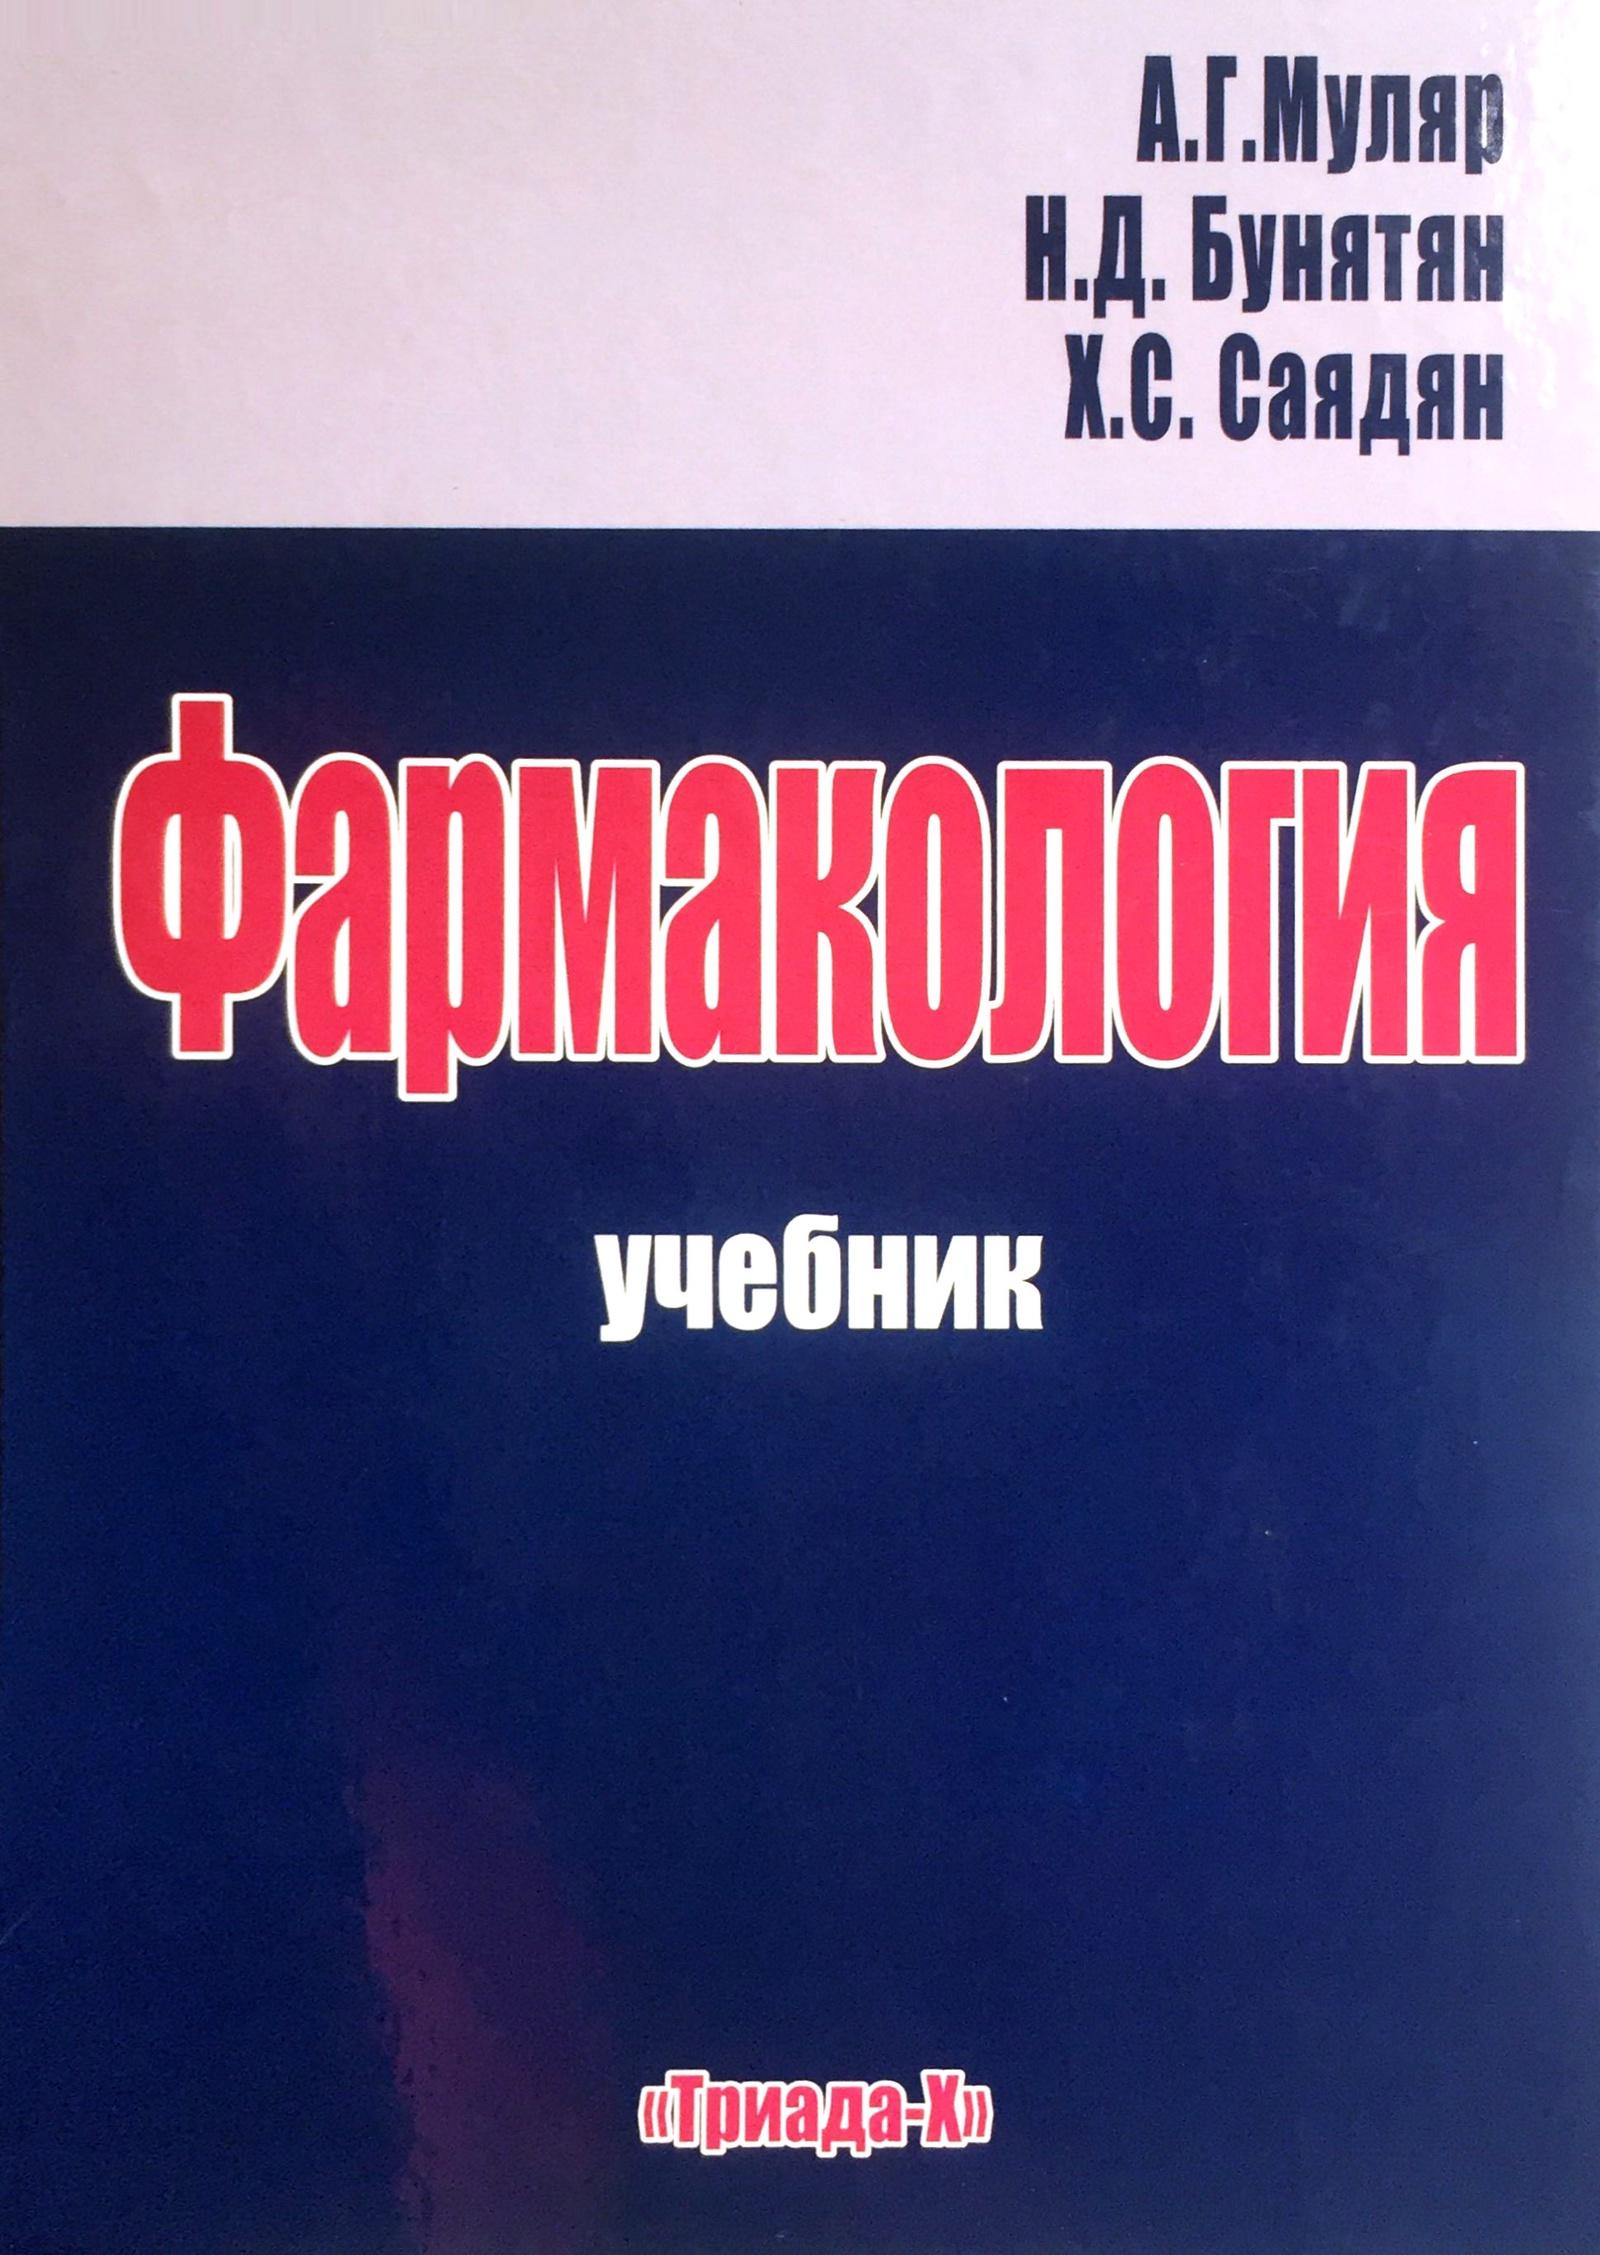 А.Муляр , Н.Бунятян, Х.Саядян Фармакология